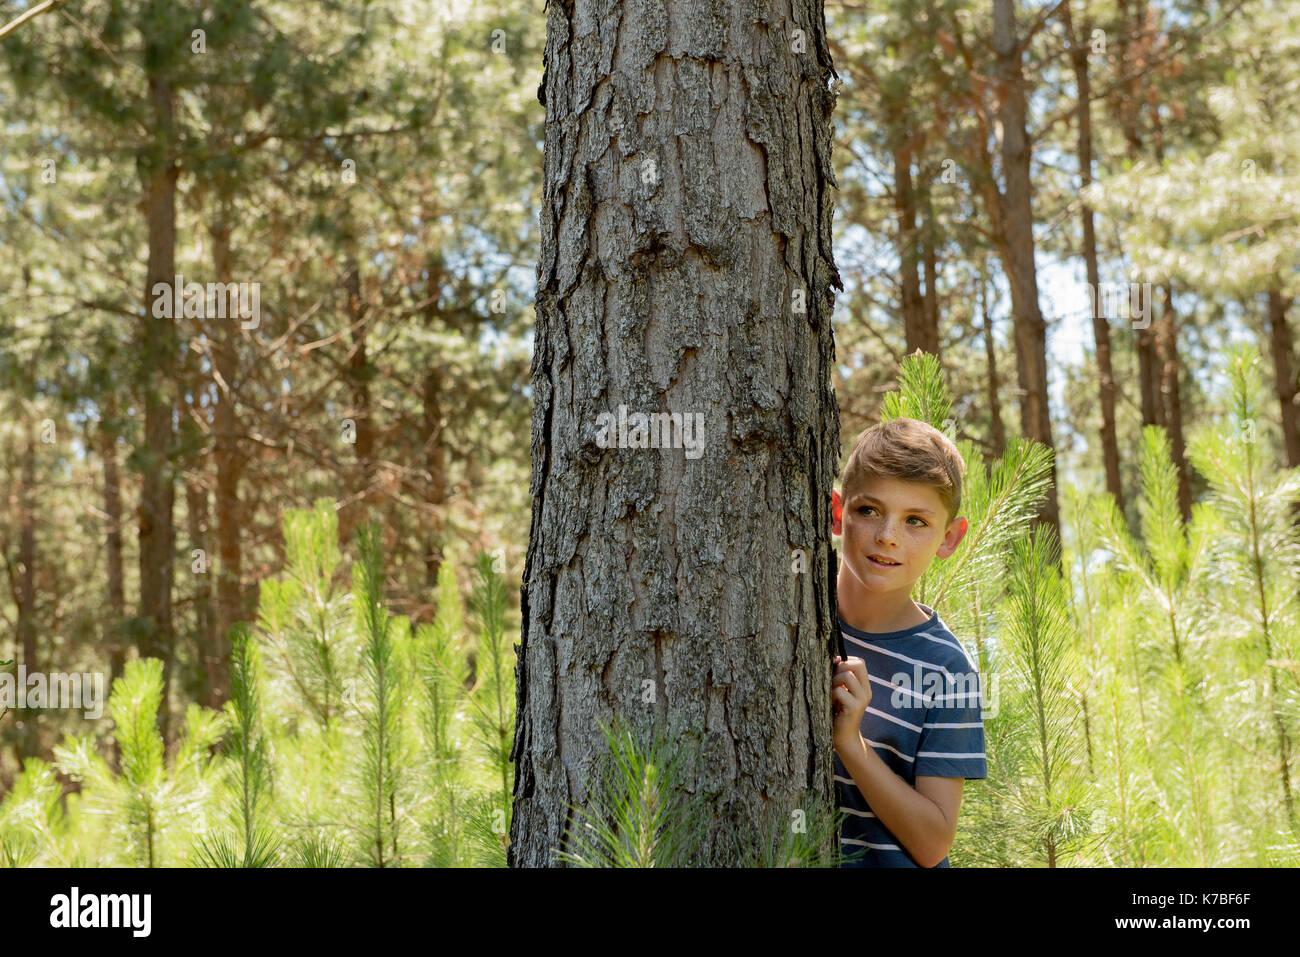 Boy hiding behind tree trunk - Stock Image